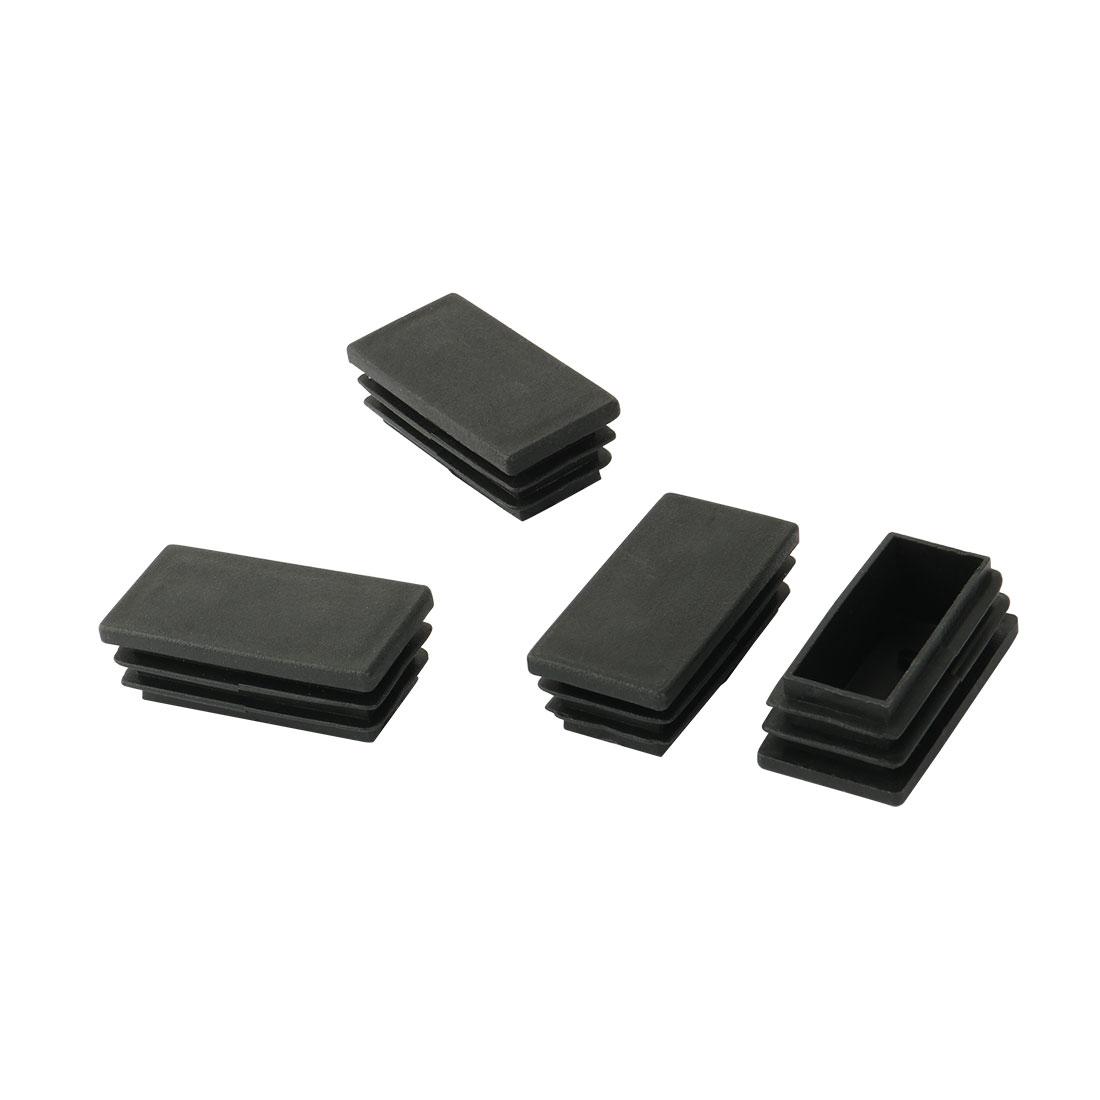 4 Pcs Black Plastic Rectangle Blanking End Tubing Cap Insert Plug Bung 50mmx25mm